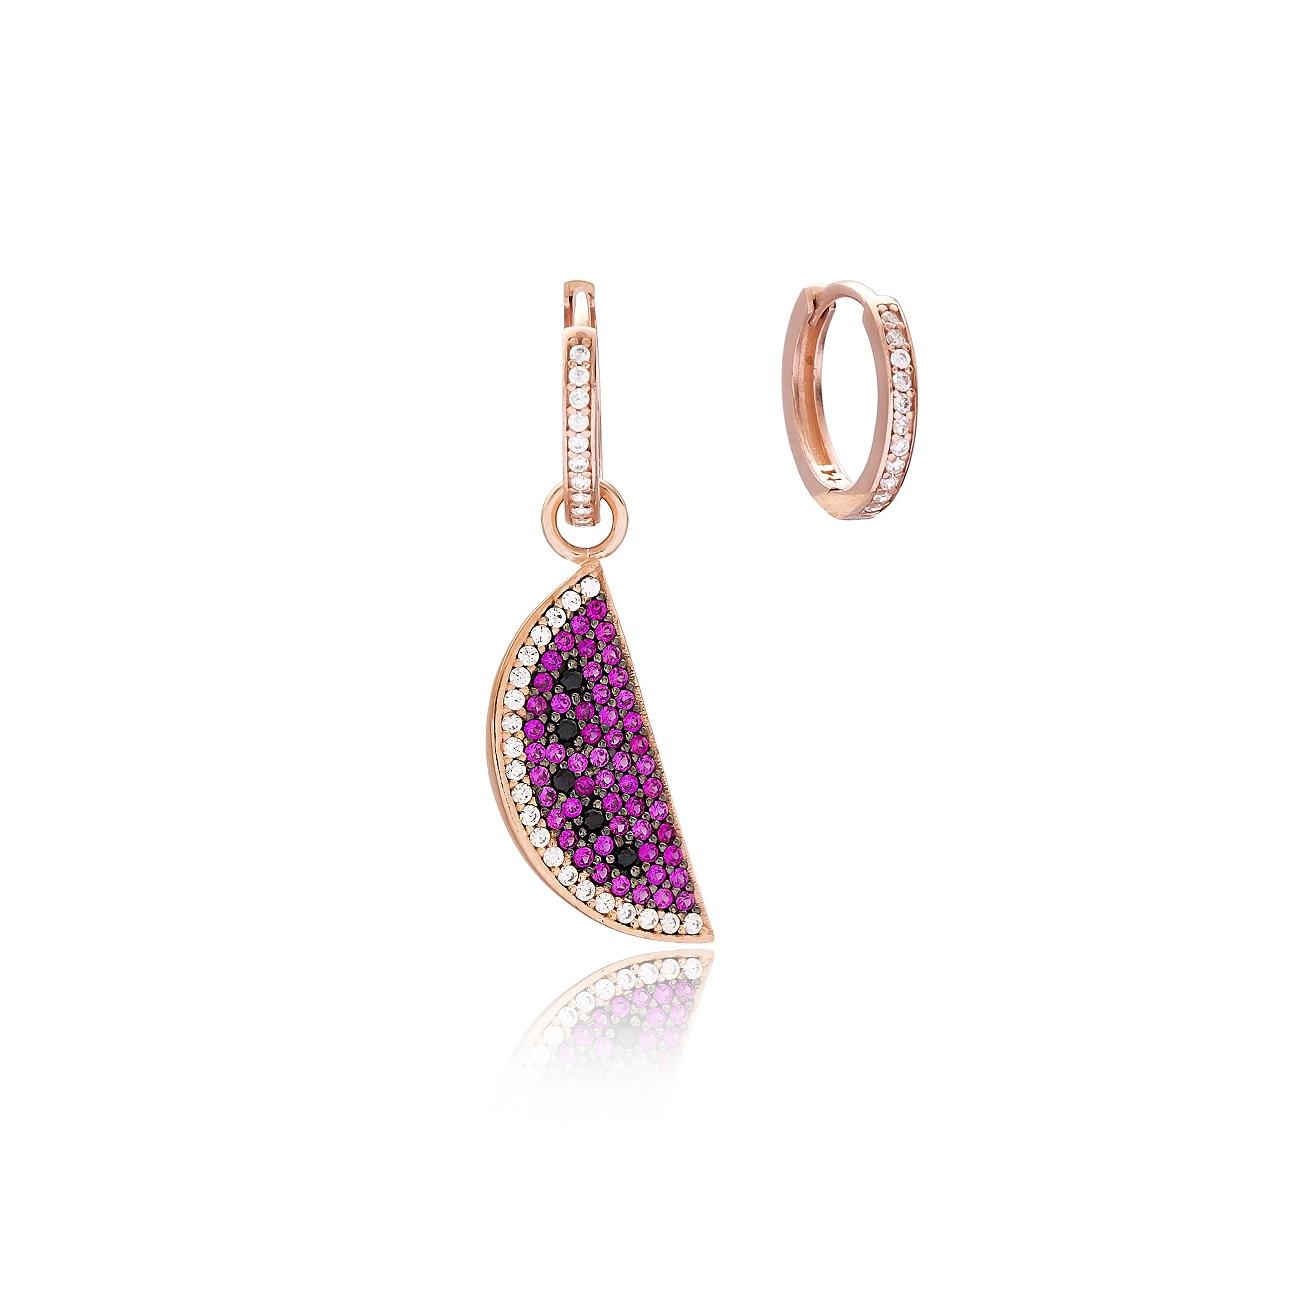 Fashion Ruby Watermelon Design 925 Sterling Silver Earring